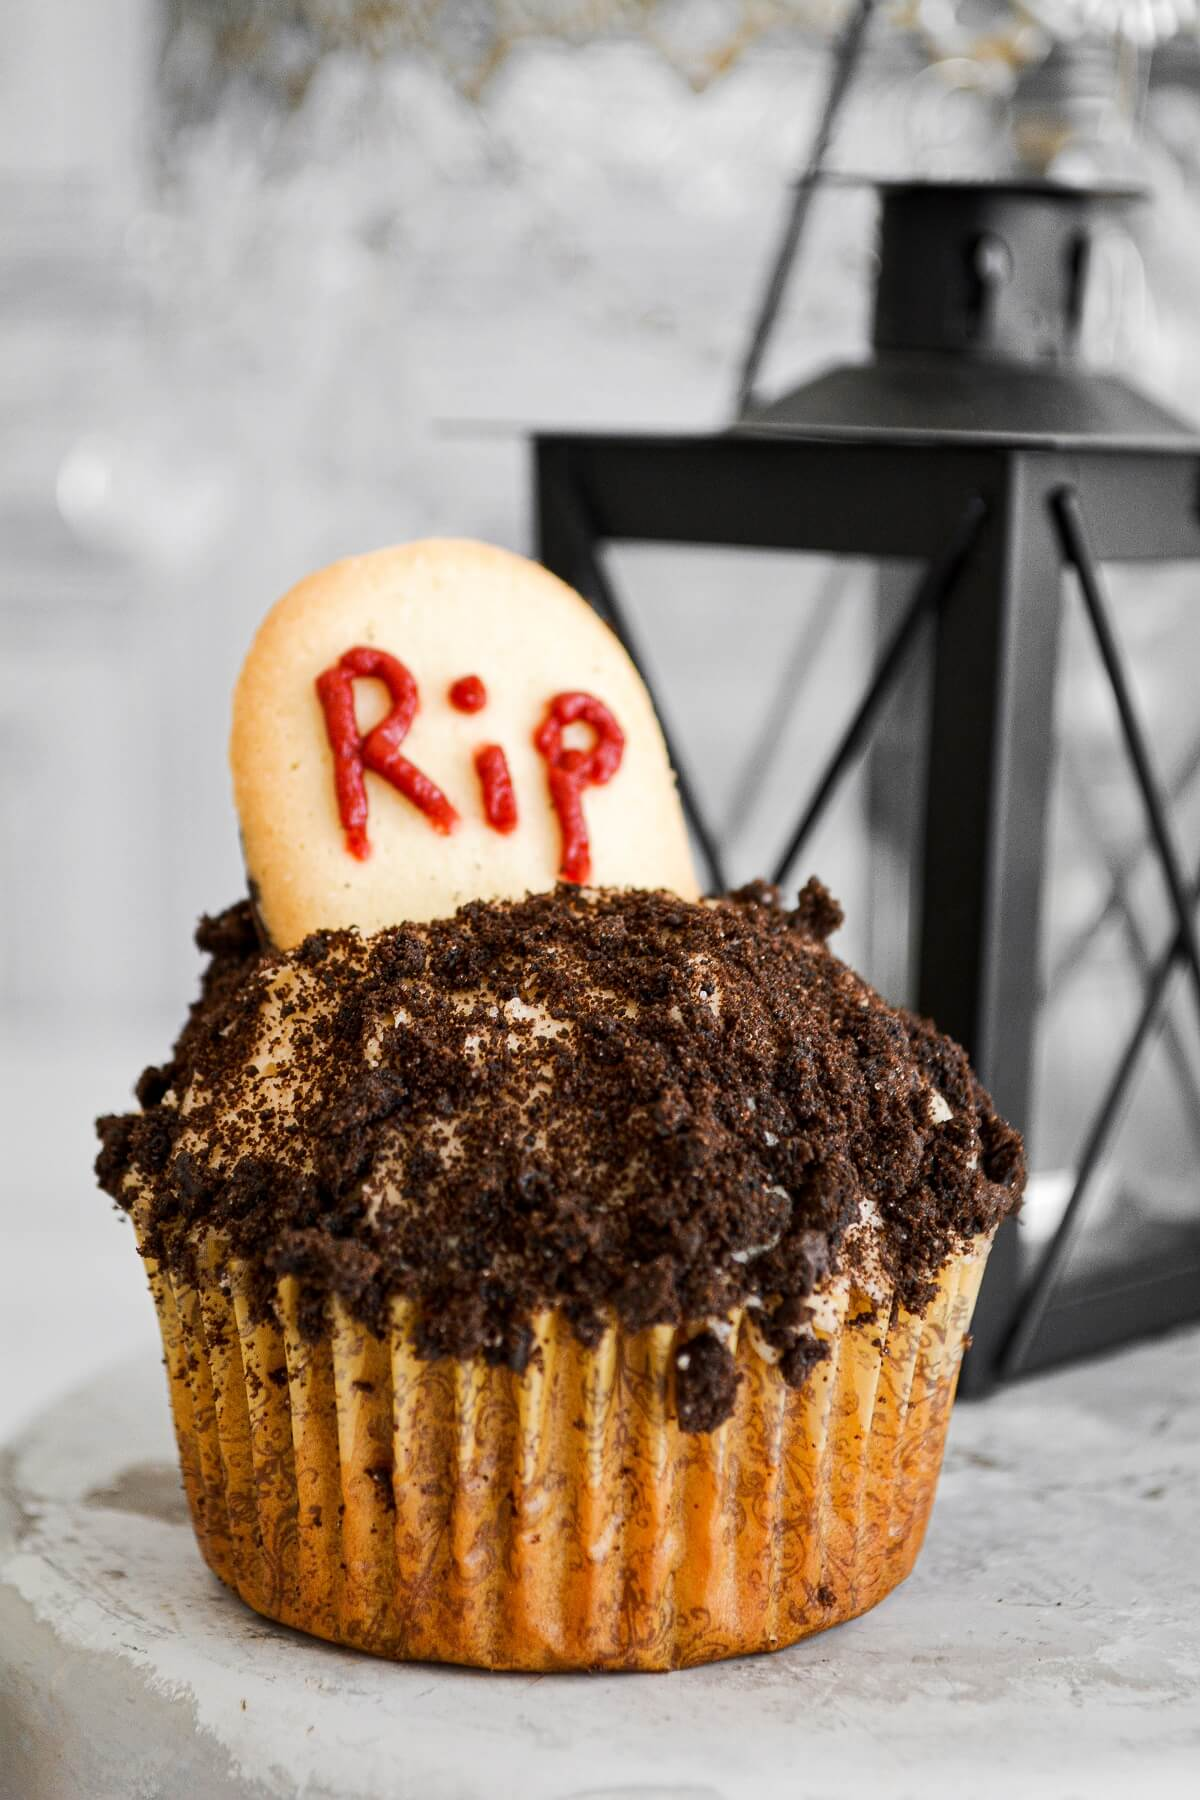 RIP cupcake for Halloween.